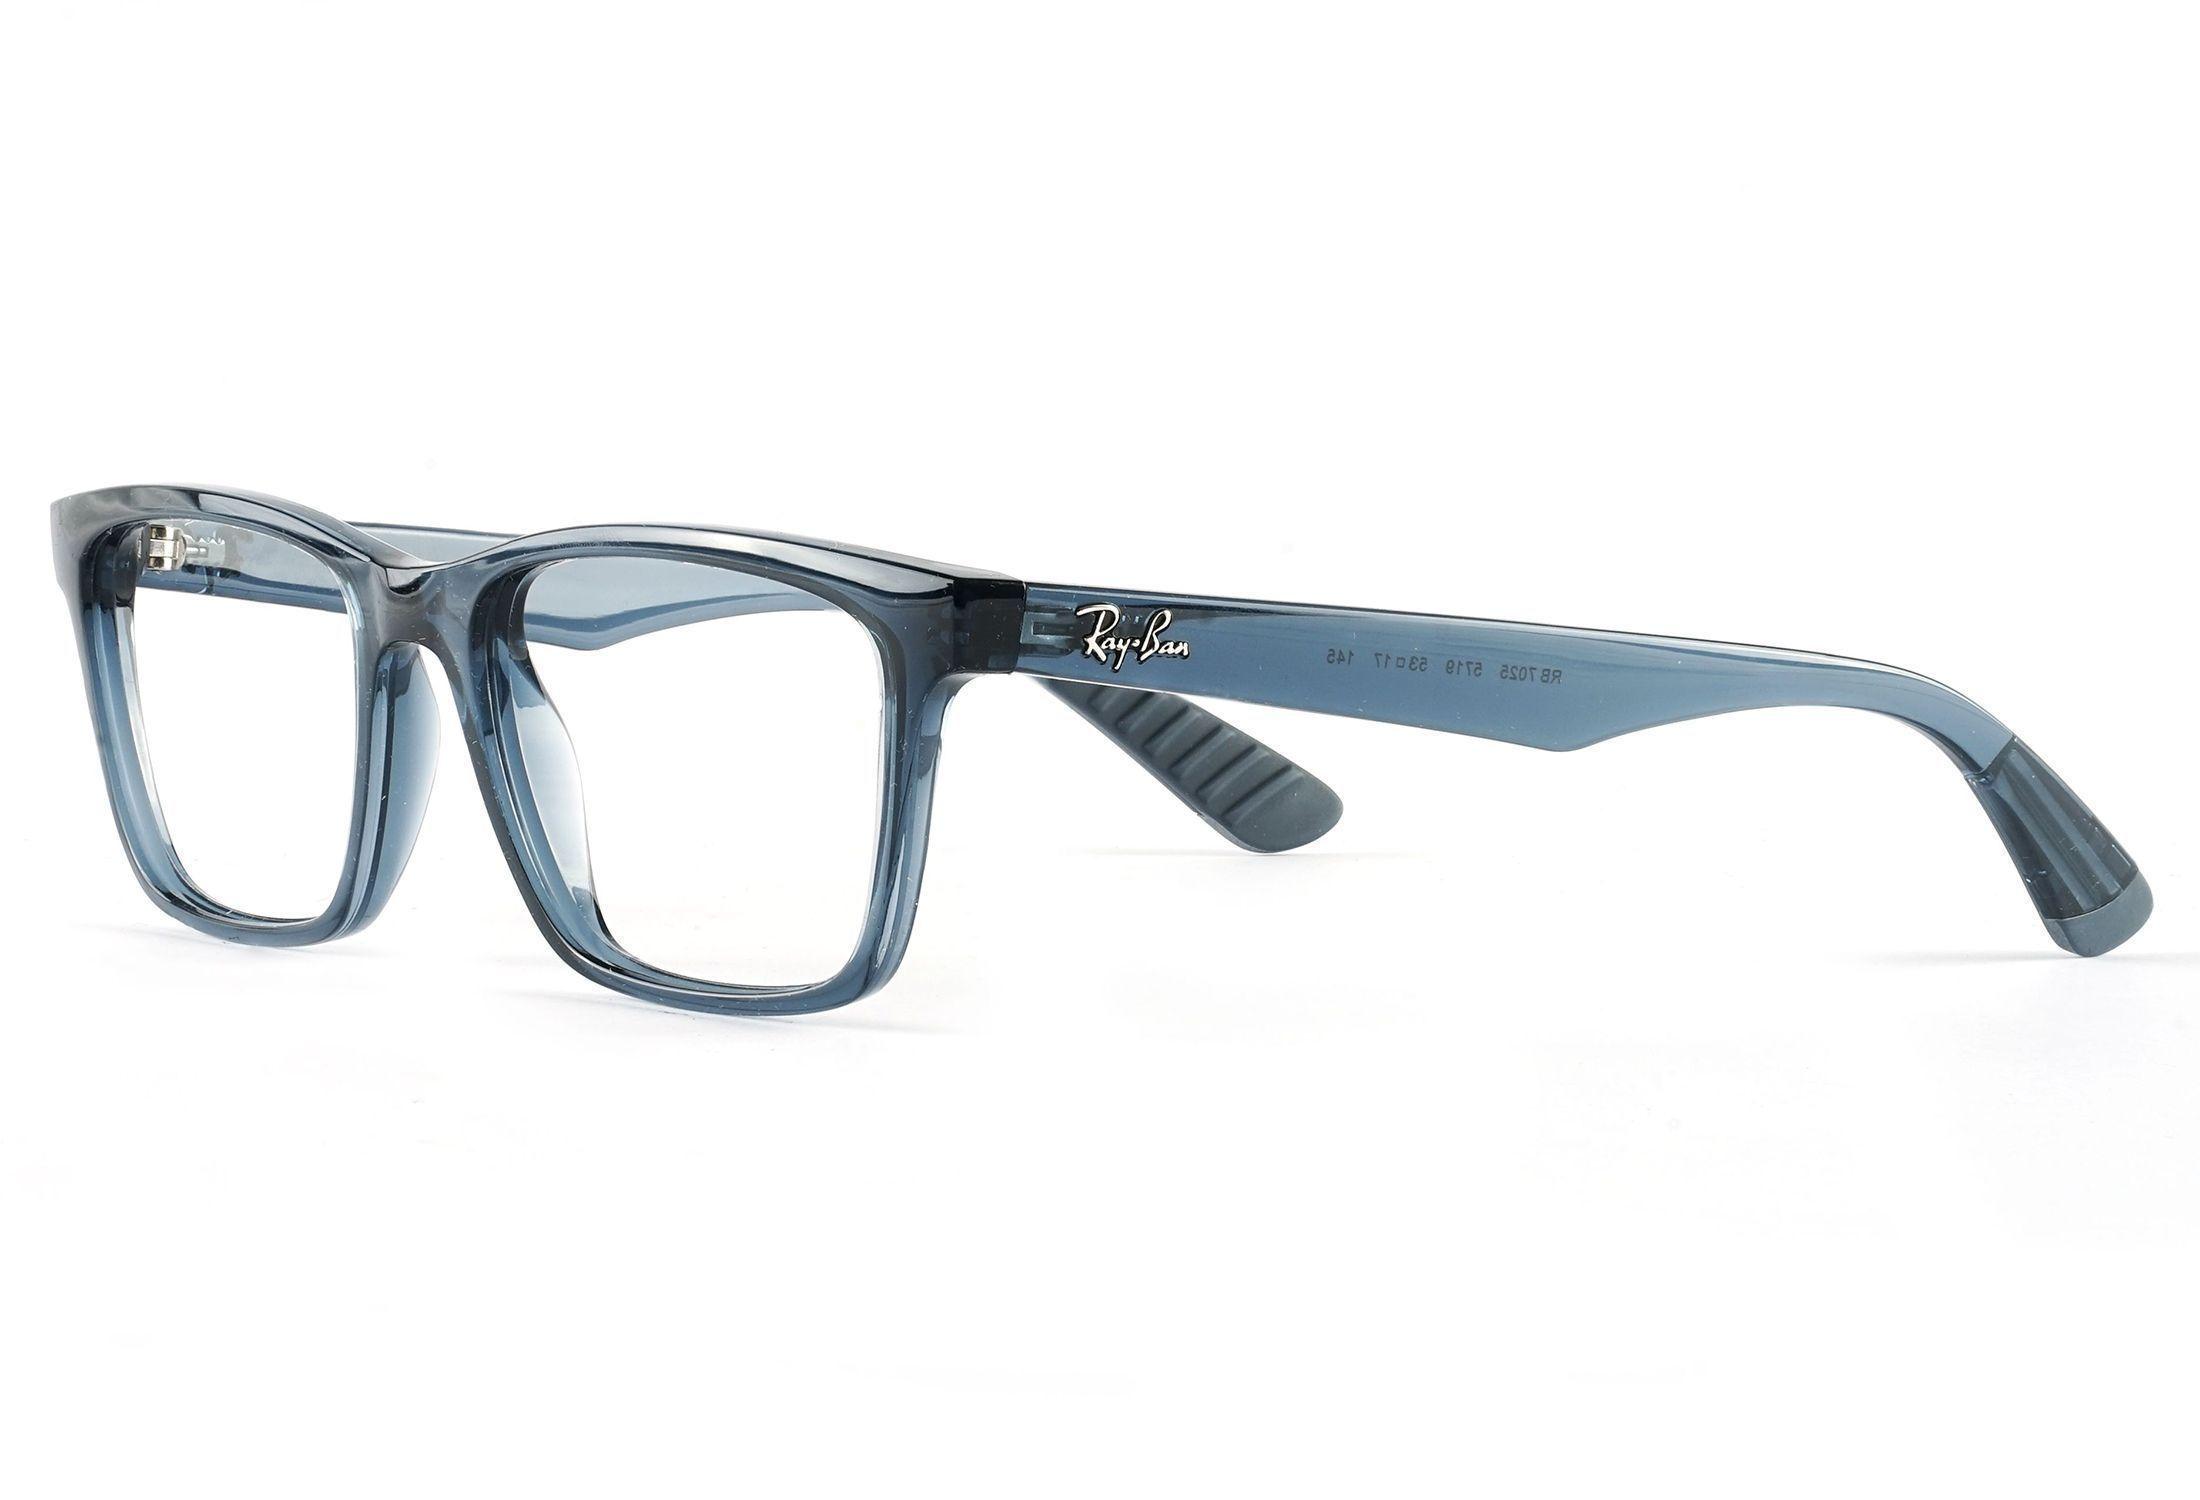 1ad3049dff Ray-Ban rb7025 eyeglasses